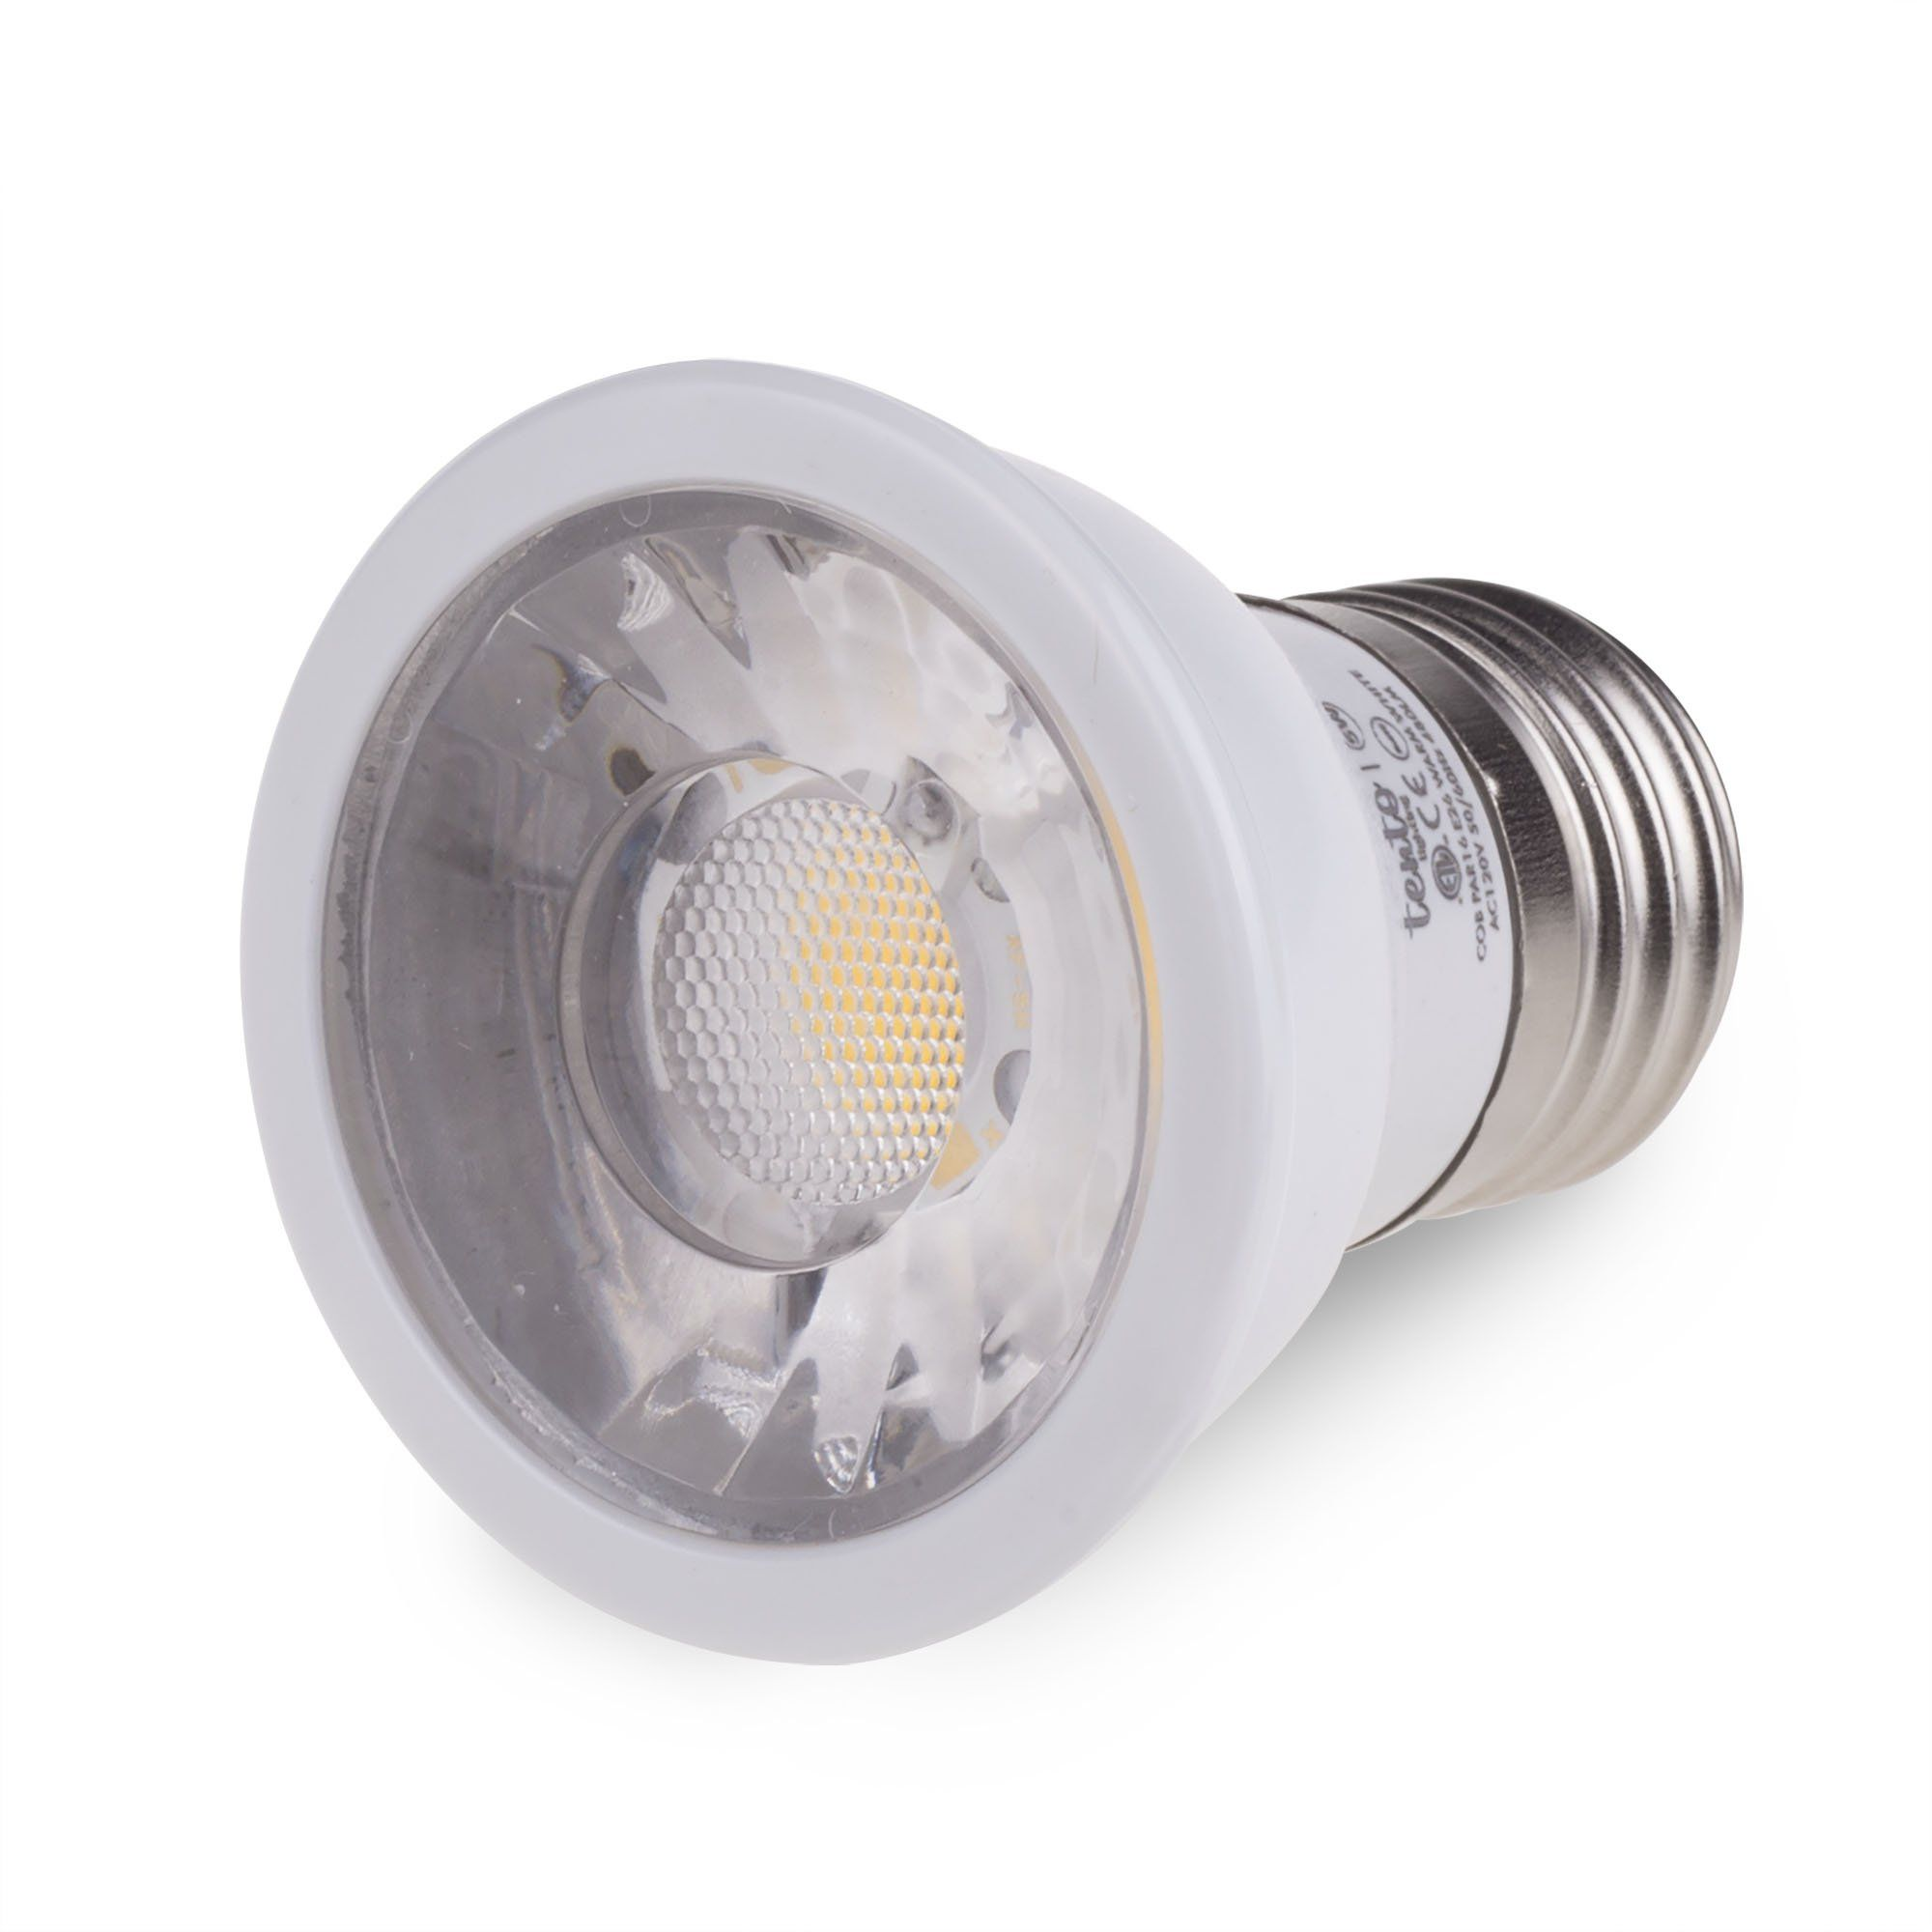 Dimmable Led Par16 Light Bulbs Daylight White Color 5000k 10 Pieces Pack Ac 110v 120v E26 Pot Light Bulbs Recessed Recessed Light Bulbs Light Bulbs Pot Lights